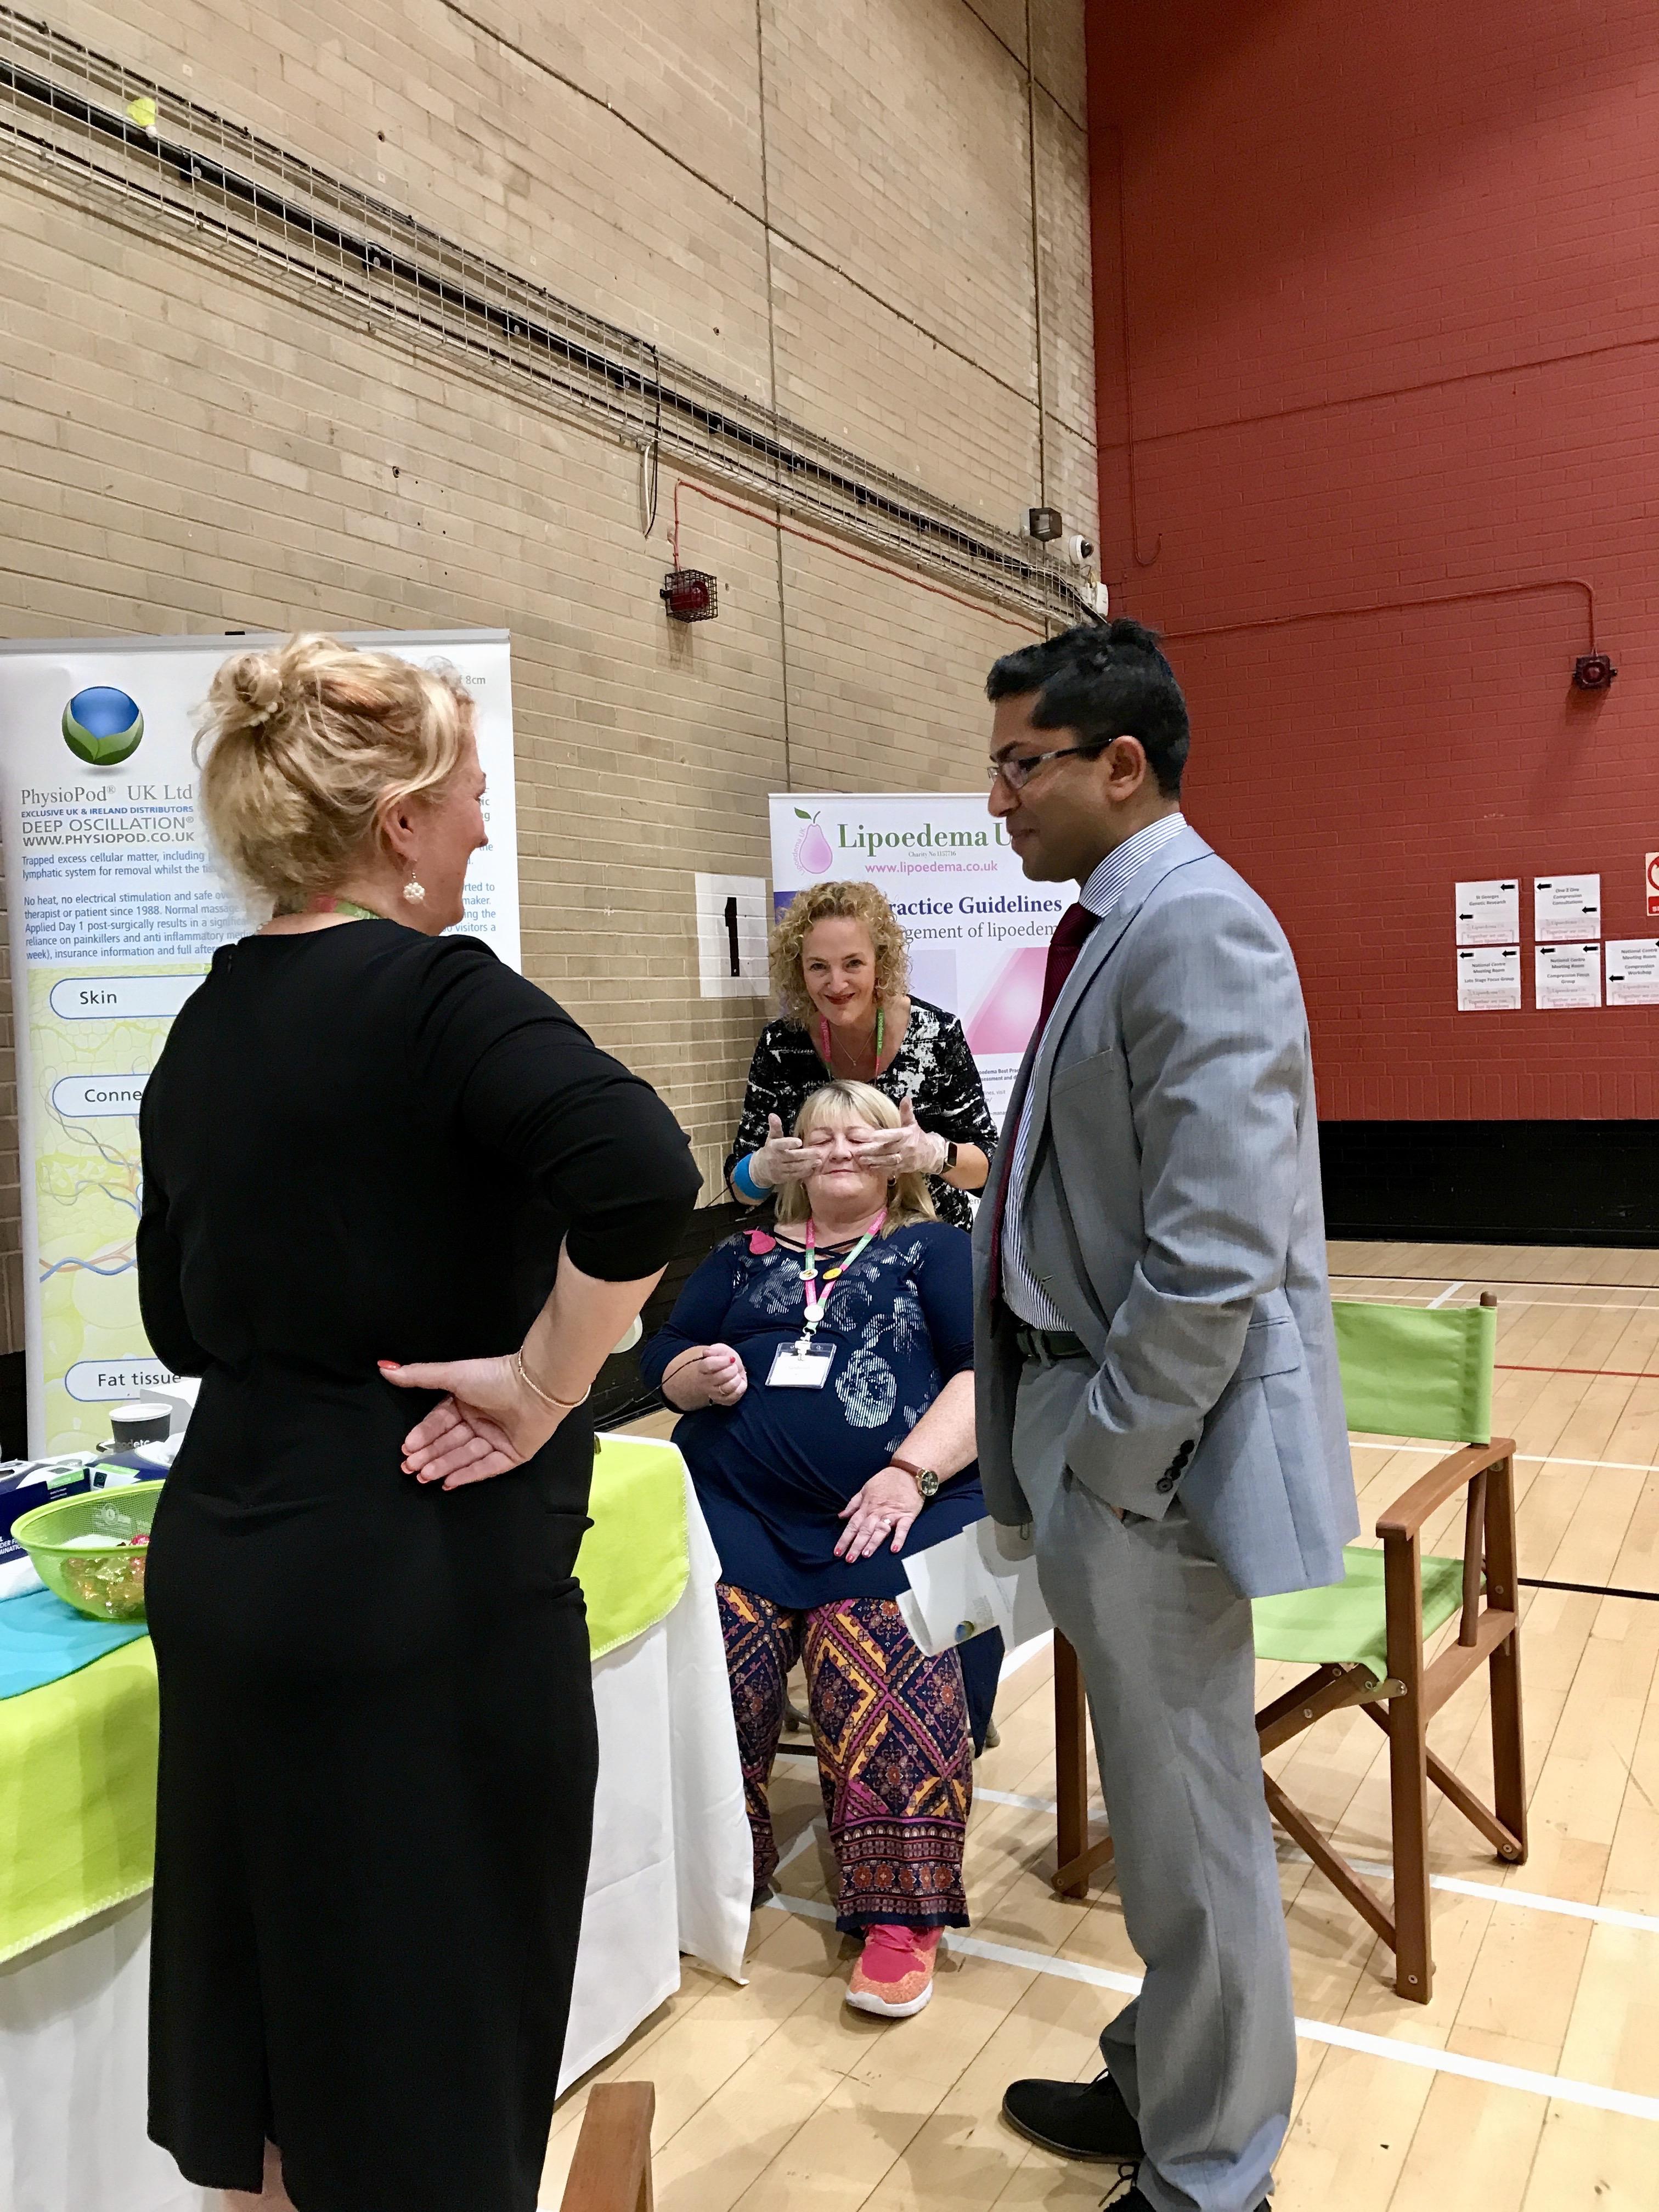 Lipoedema UK Conference and Workshop 2017 - Lipoedema UK